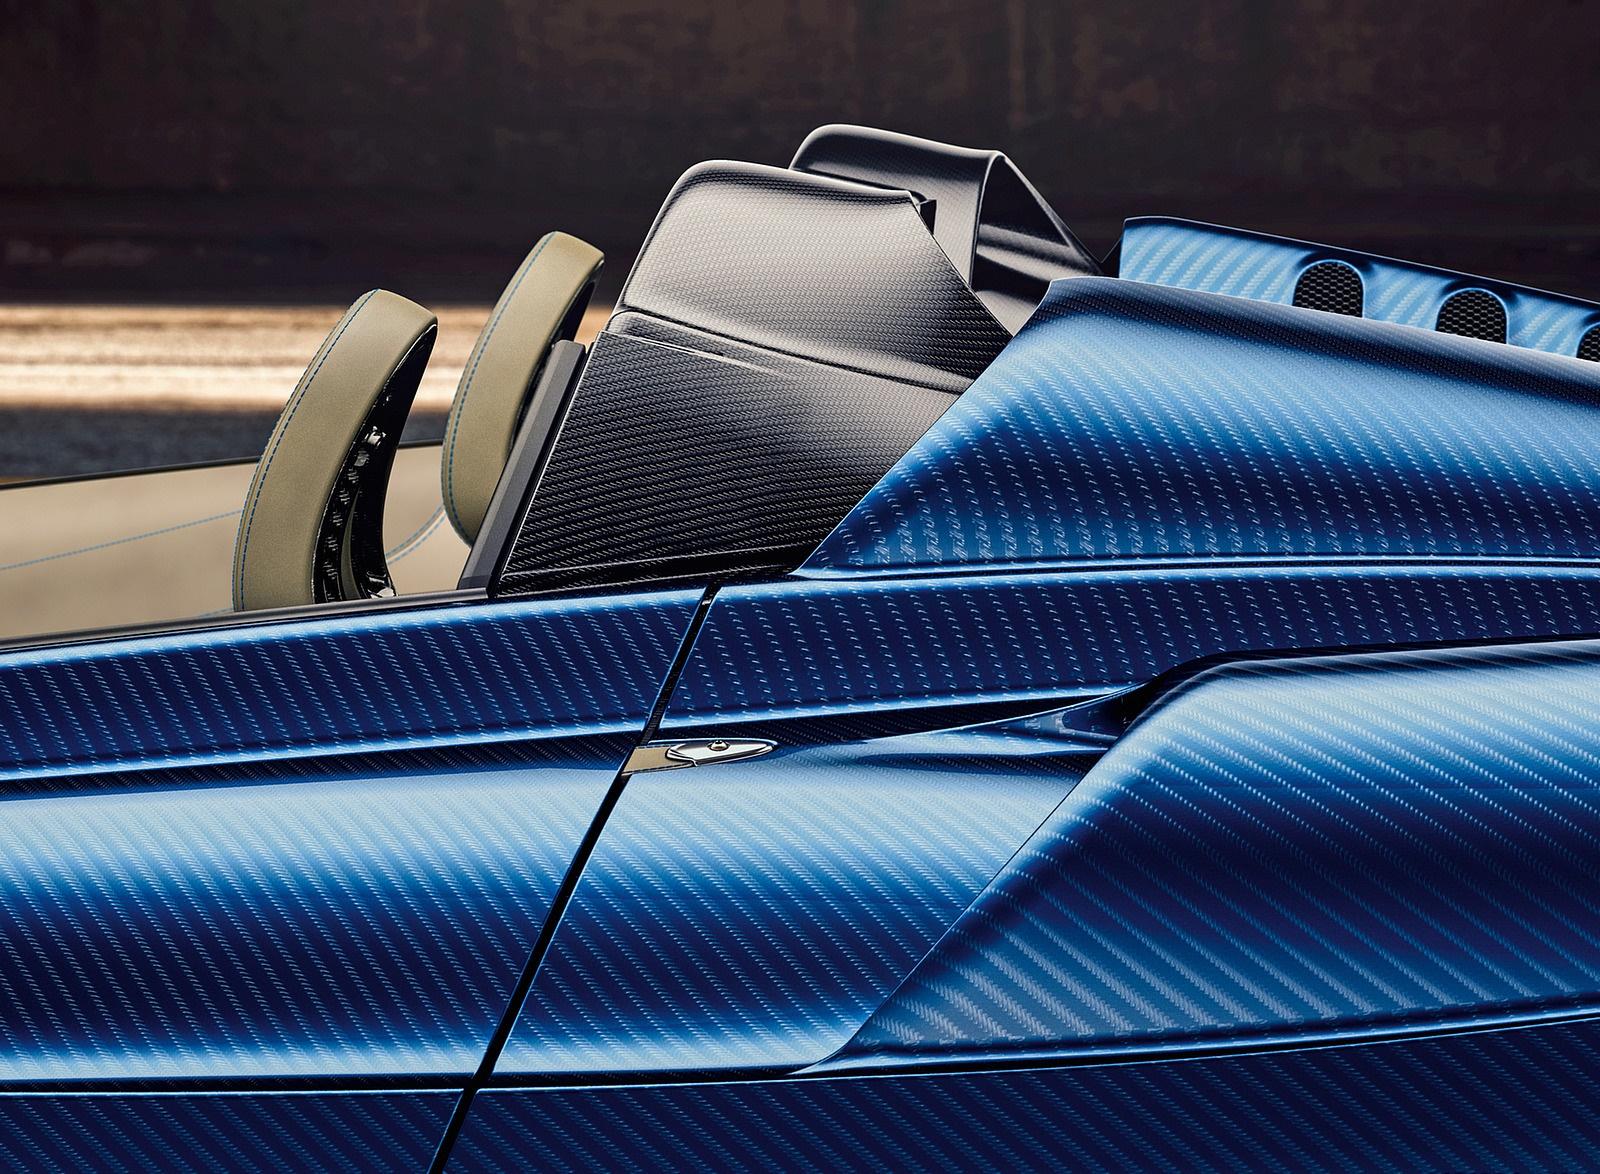 2018 Pagani Huayra Roadster Detail Wallpapers (7)